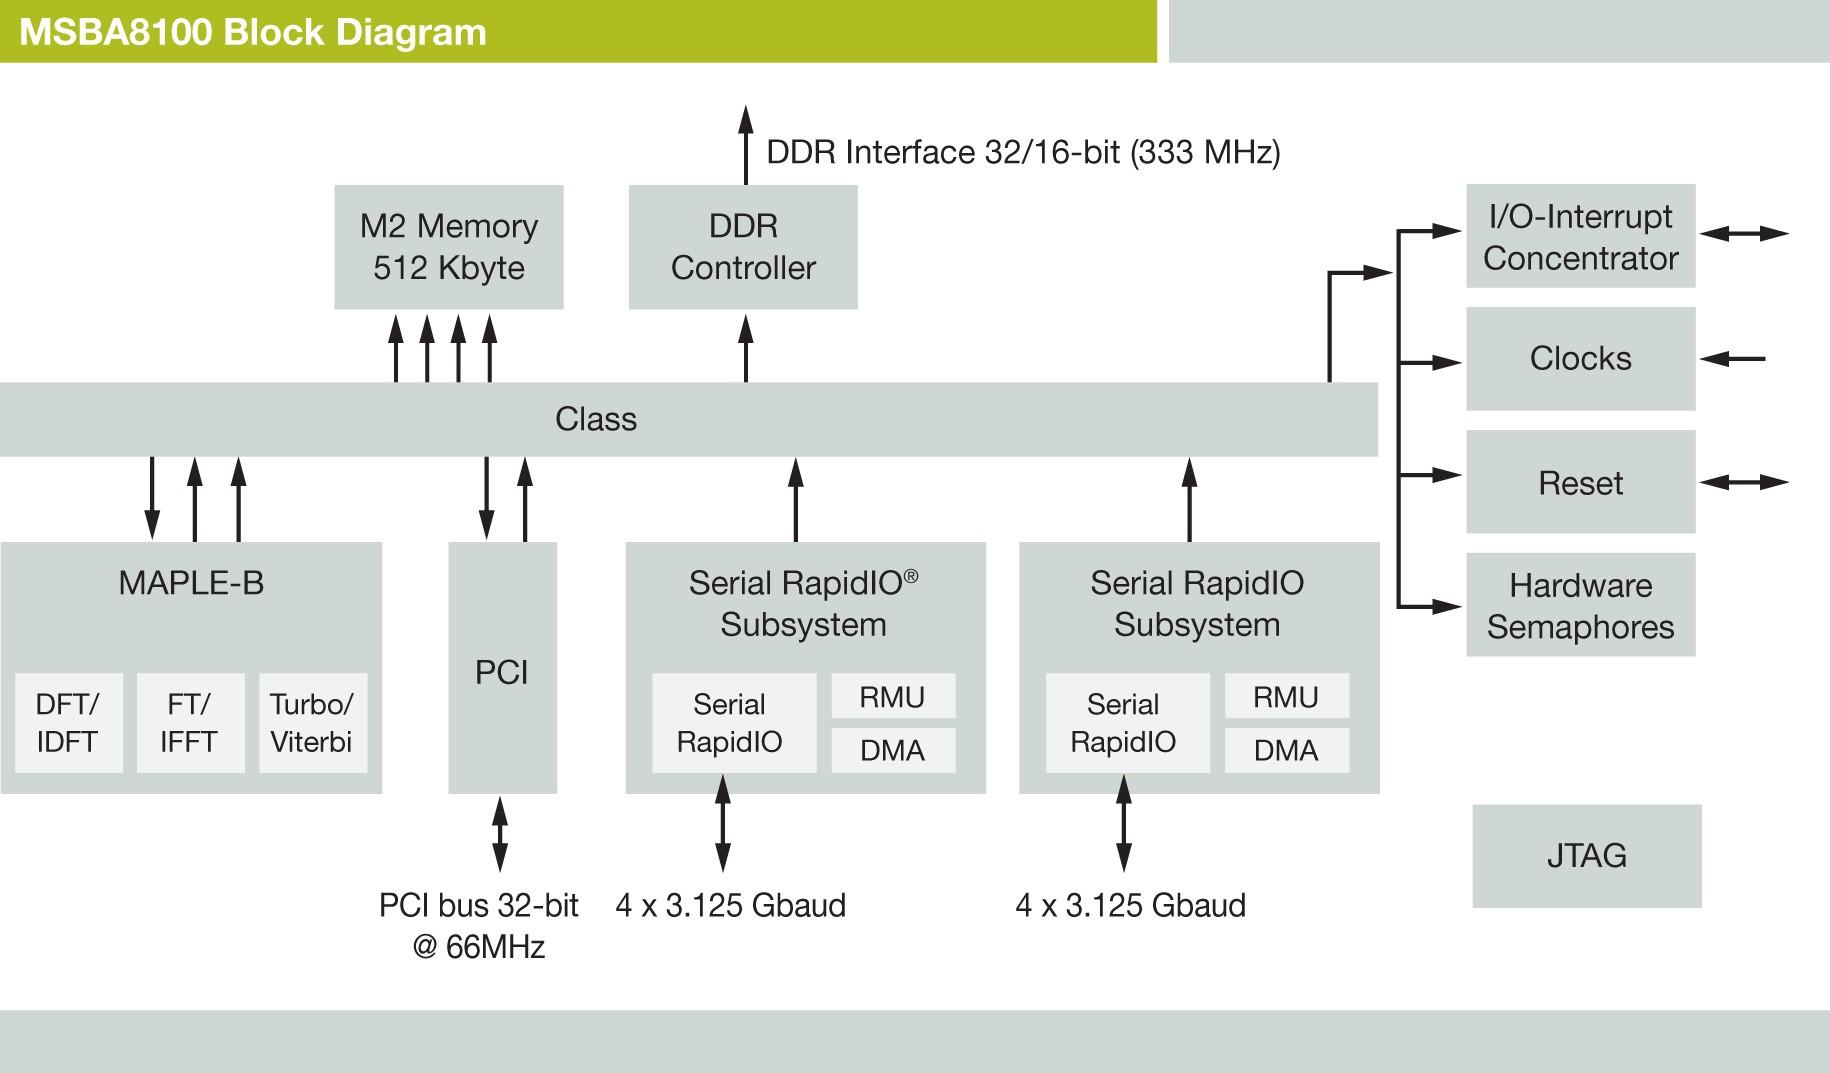 Freescale Introduces Basestation Baseband Accelerator Berkeley H 264 Decoder Block Diagram Of Msba8100 Chip Graphic Courtesy